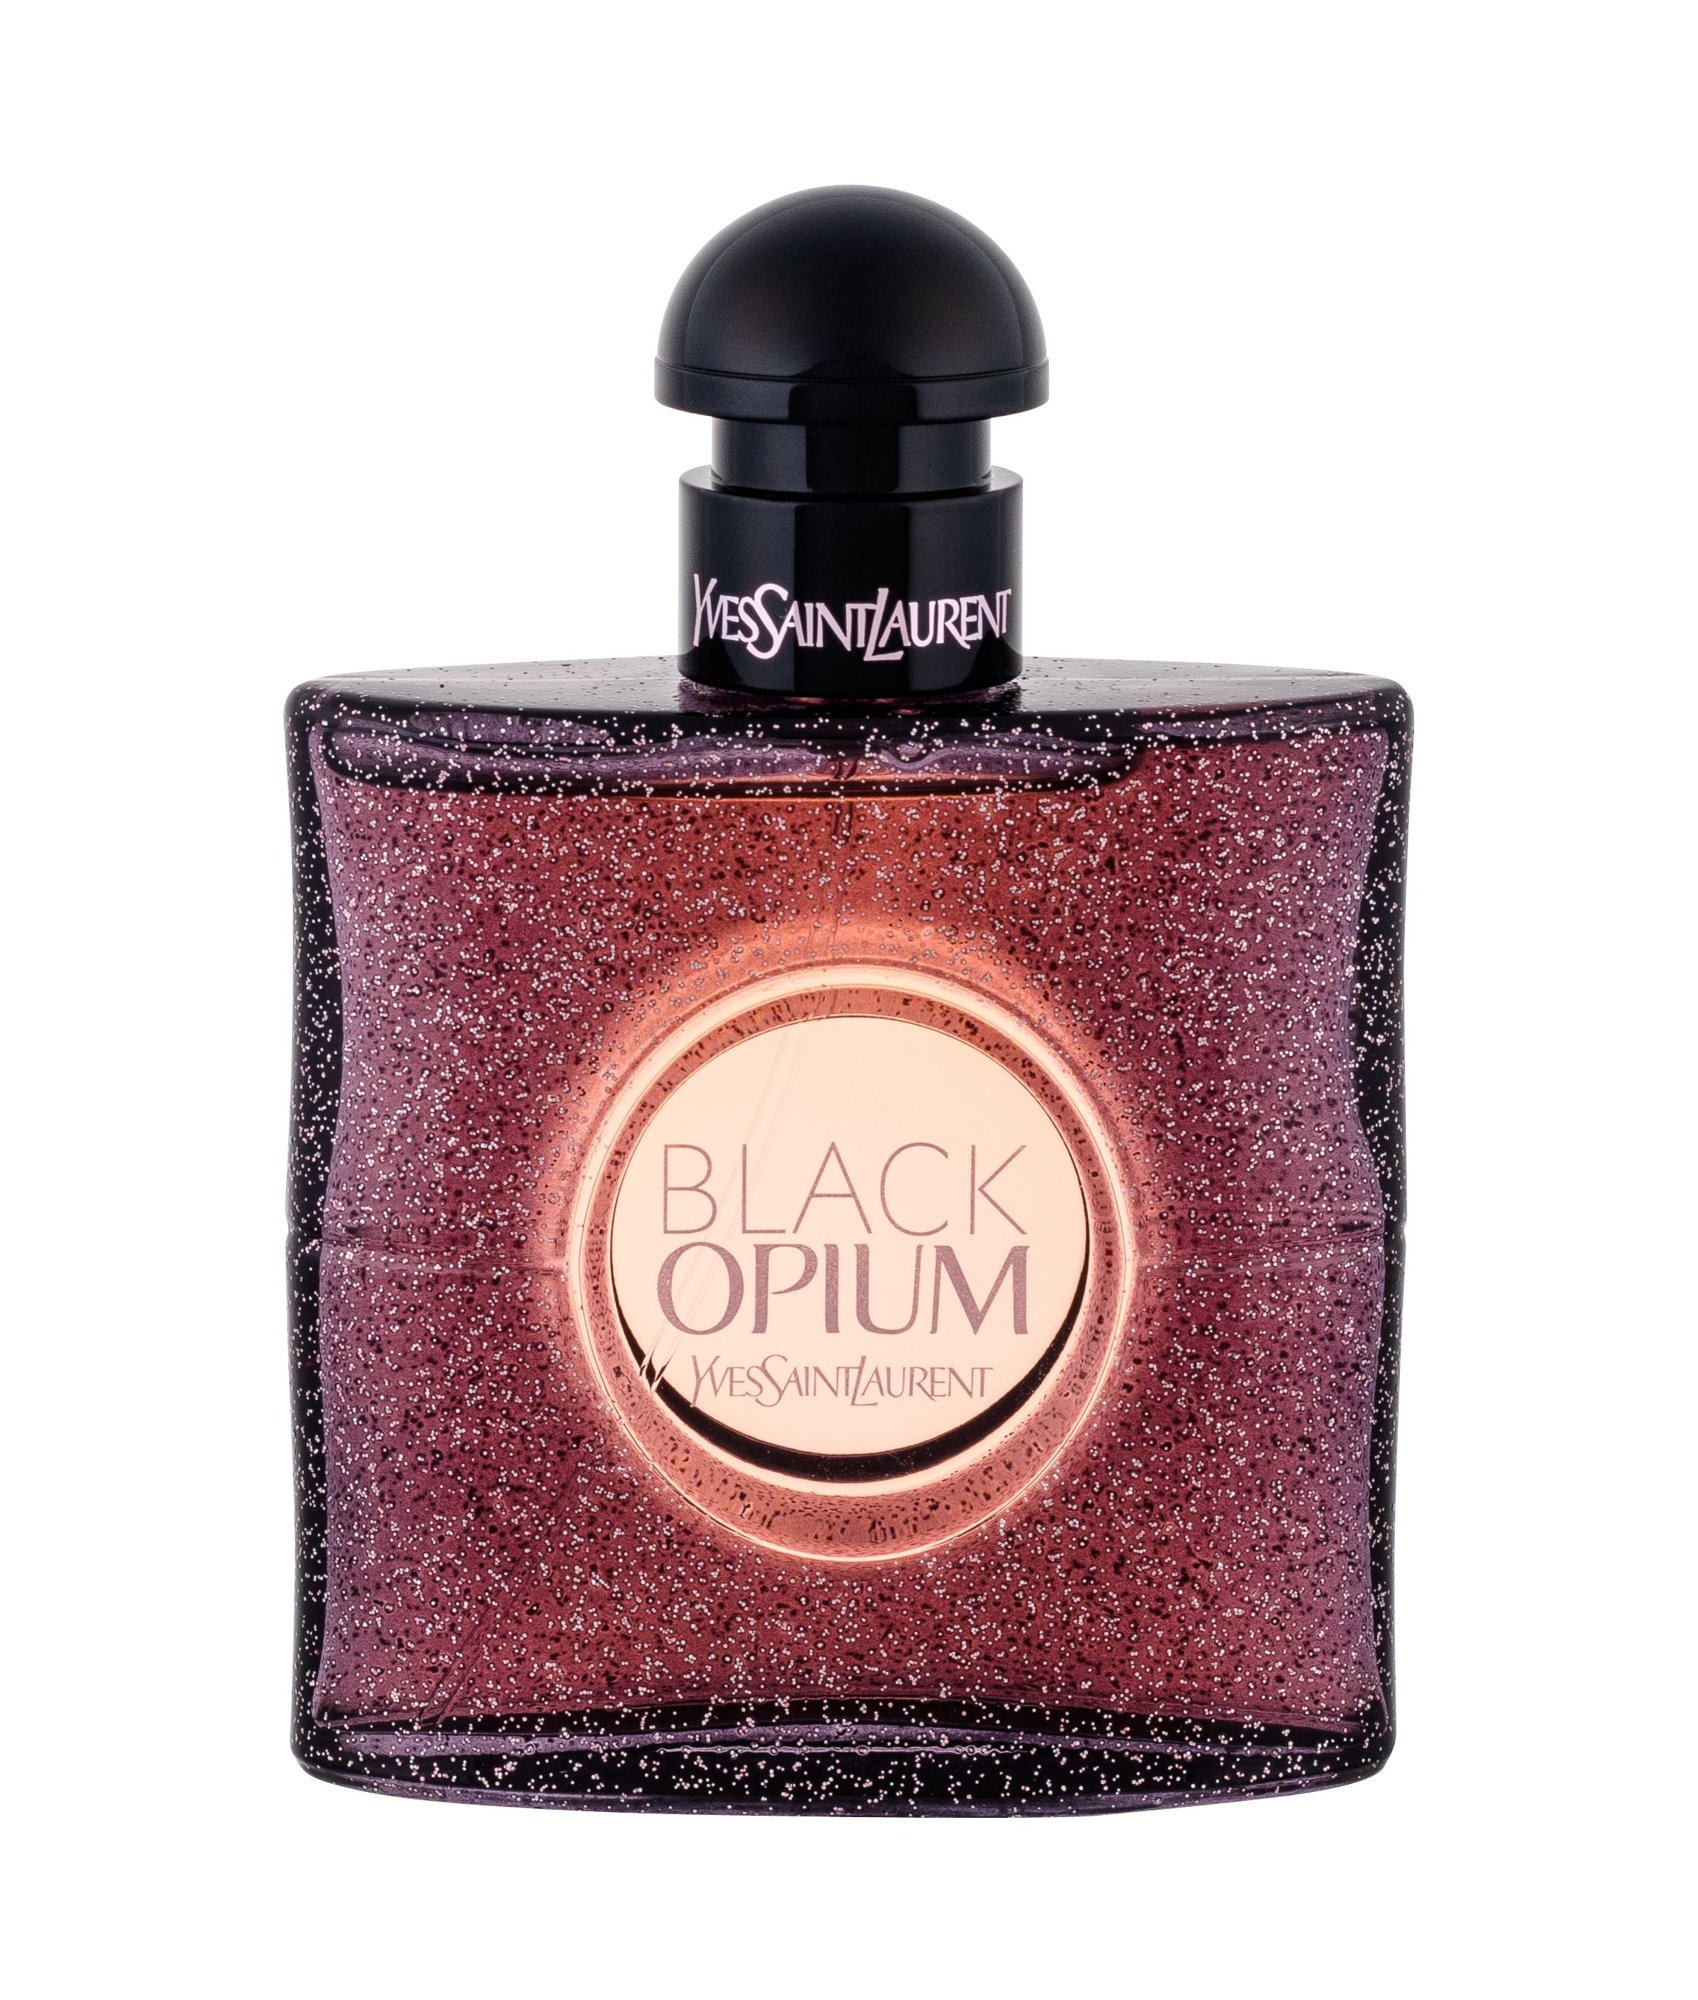 Yves Saint Laurent Black Opium, Toaletná voda 7.5ml